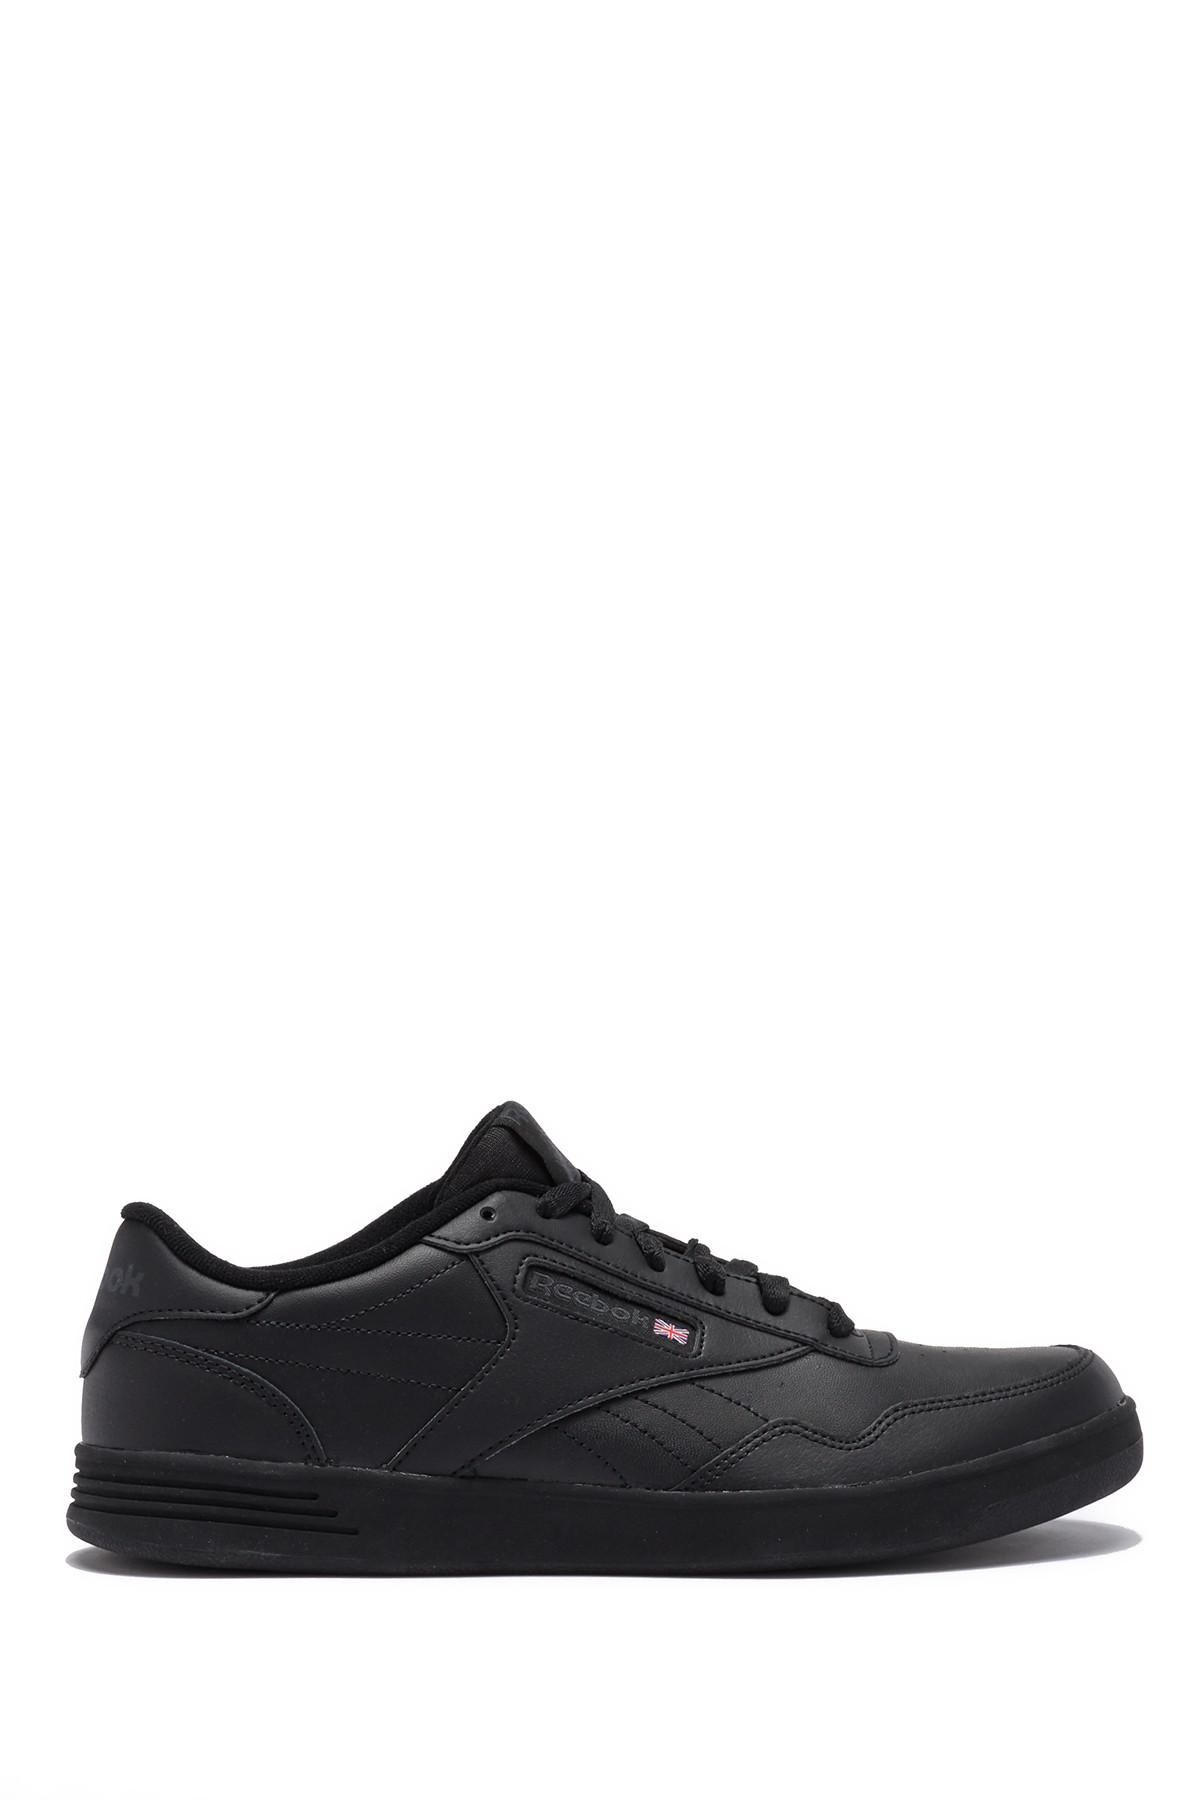 3647841b5a0a Reebok - Black Club Memt Wide 4e Sneaker for Men - Lyst. View fullscreen